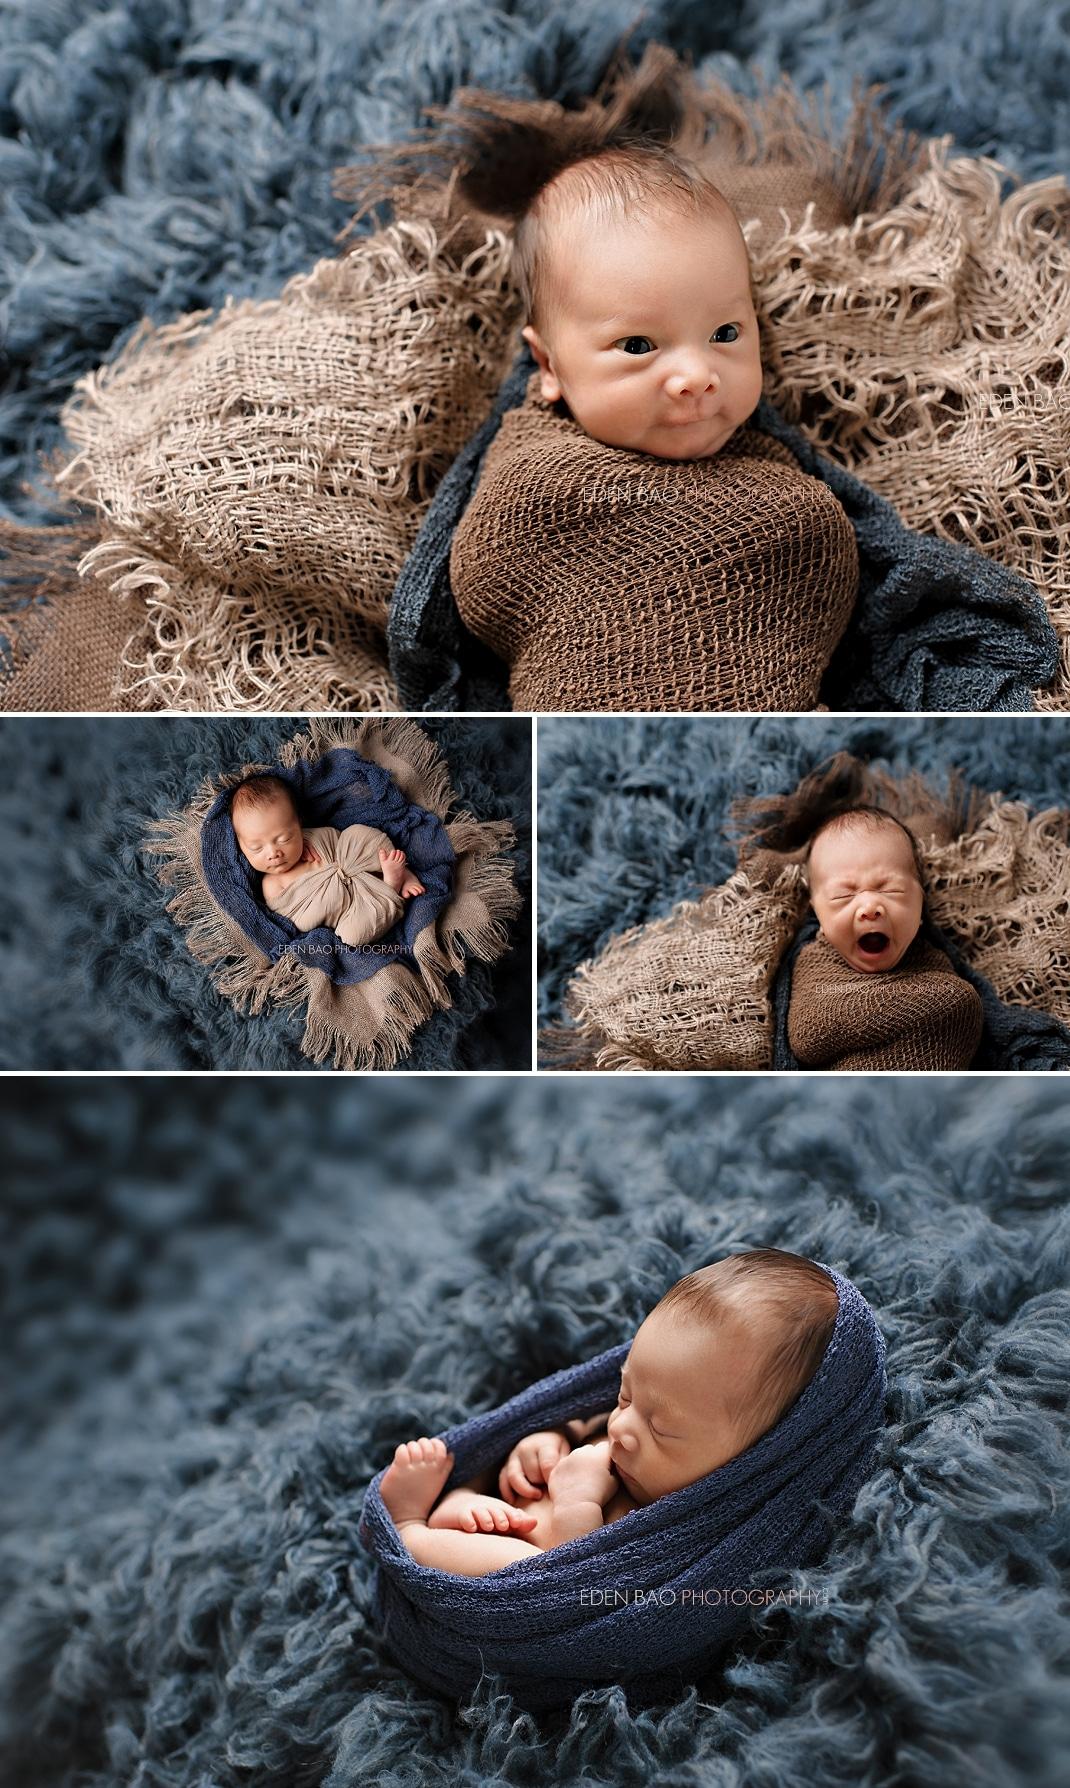 Richmond Vancouver BC Newborn Photographer Eden Bao Oliver blue shaggy rug flokati